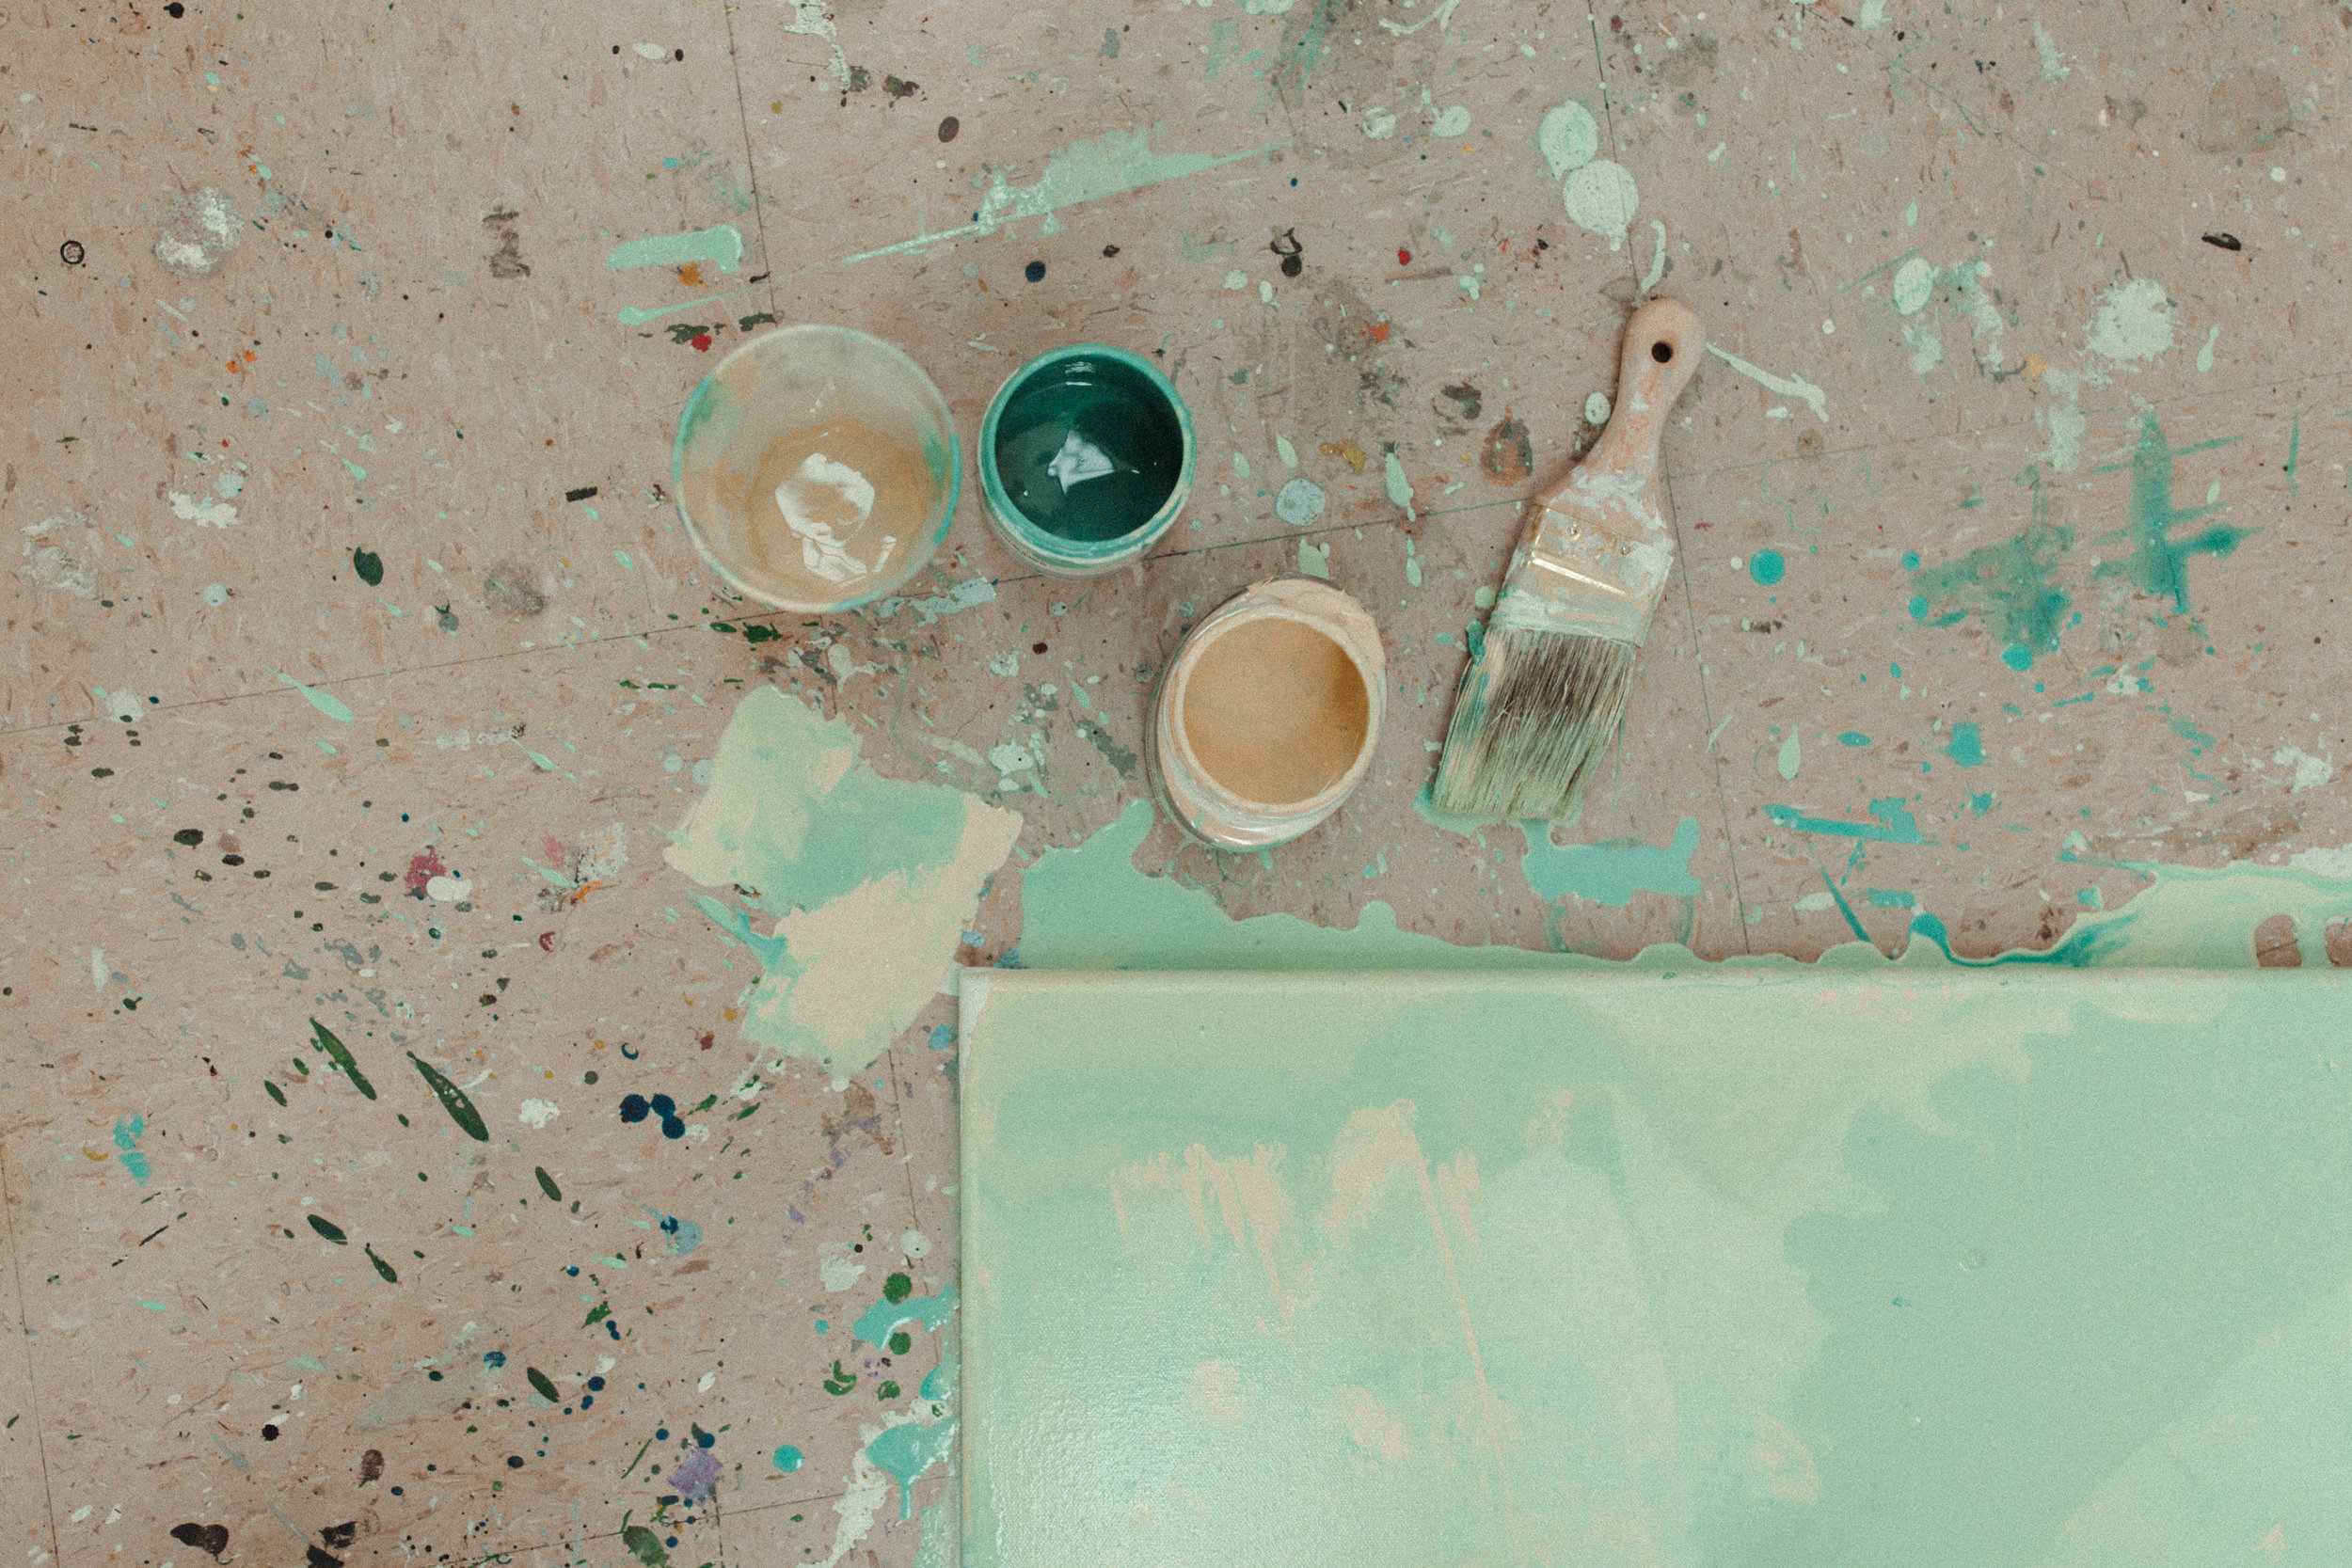 emily-pawlica-art-process-2019-peytoncurry-0455.jpg